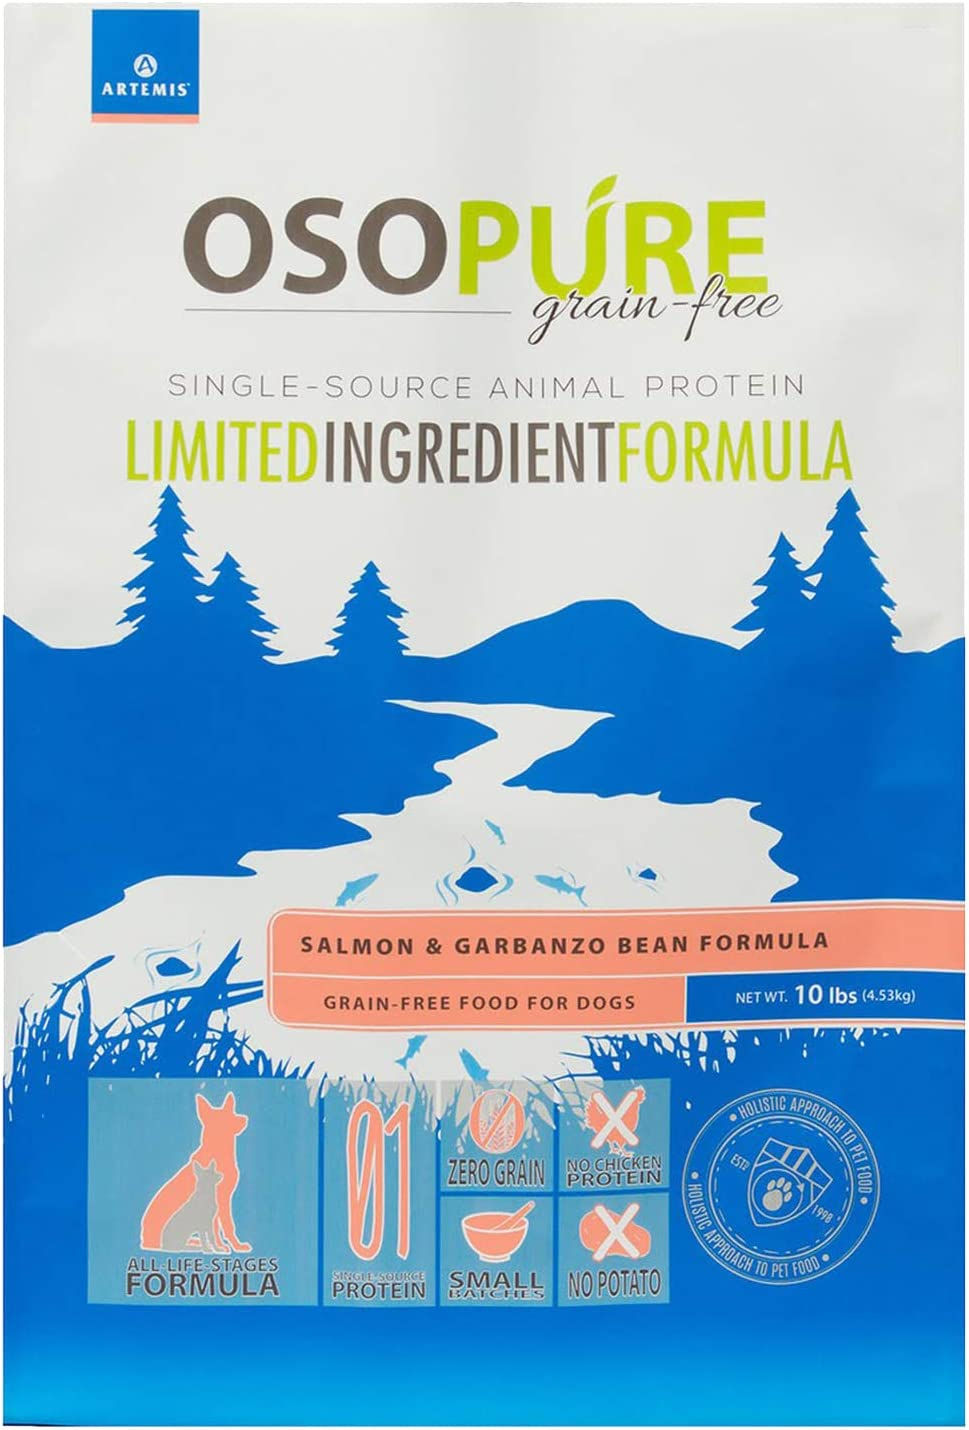 Artemis OSOPURE Grain Free Salmon & Garbanzo Bean Dry Dog Food